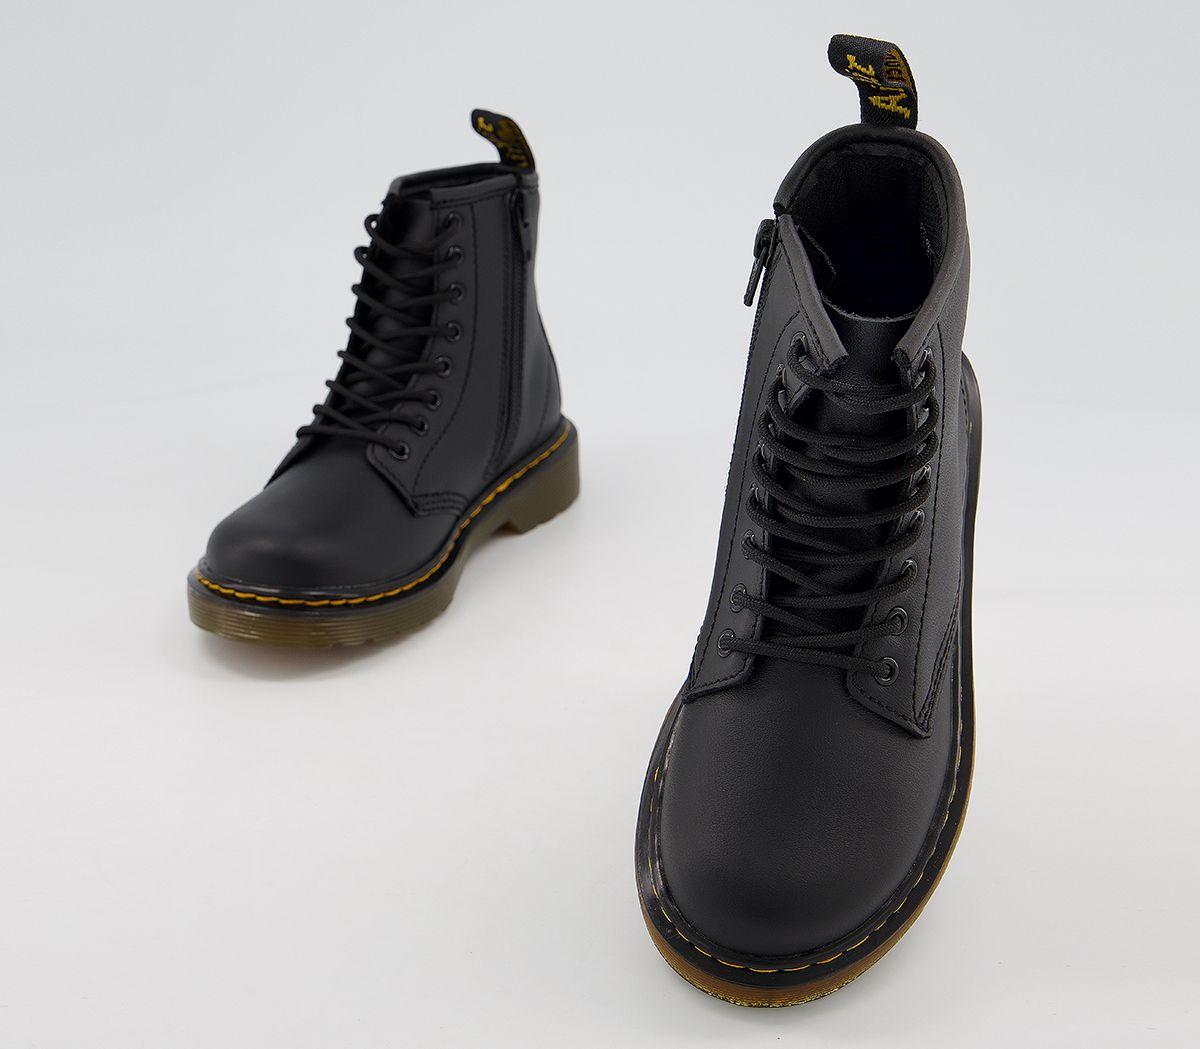 4aad4df0d06 Junior Lace Up Boots Inside Zip Delaney